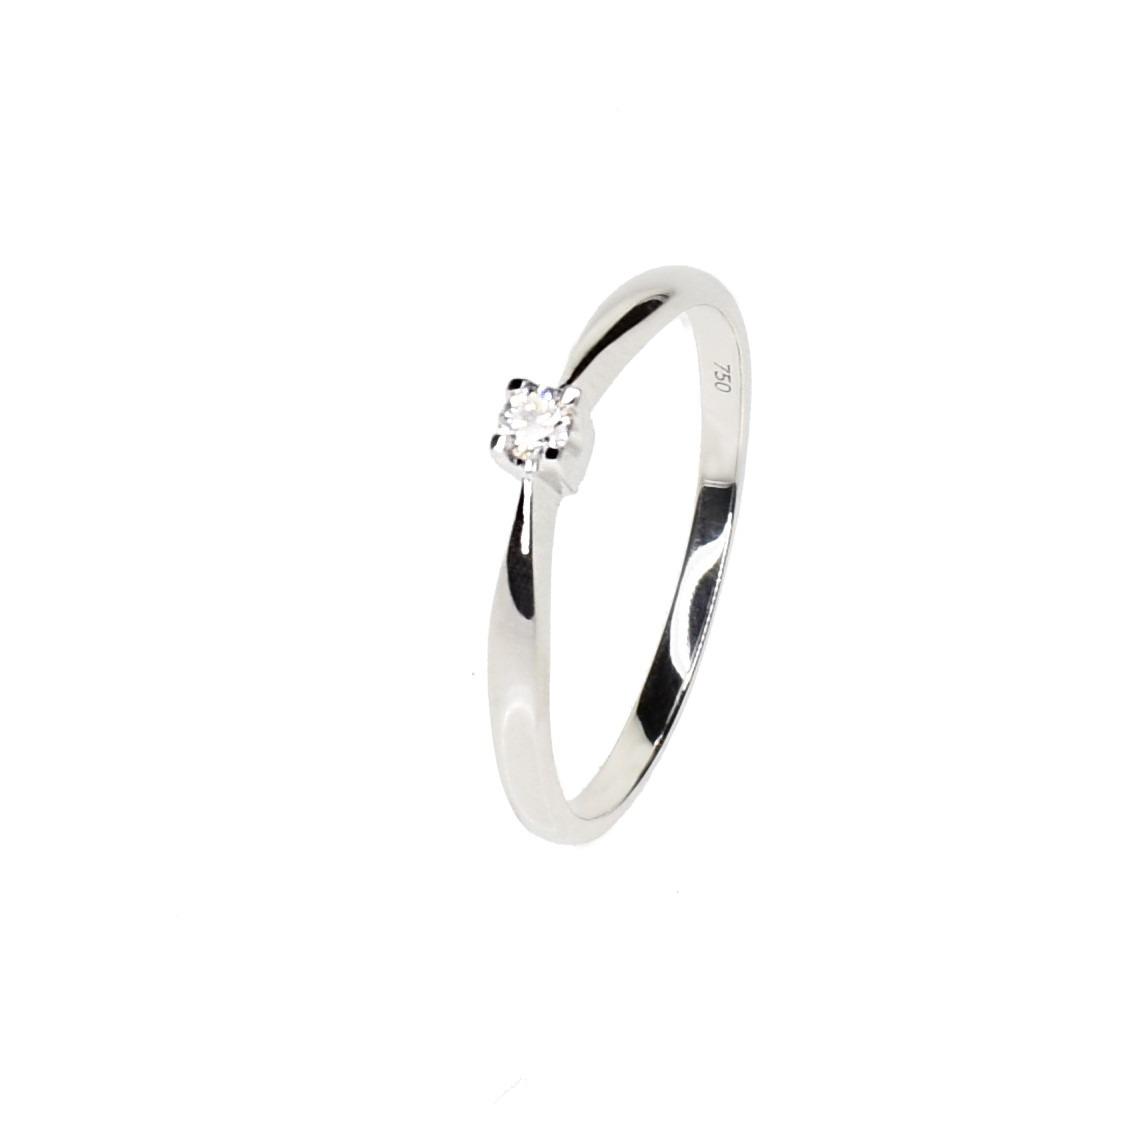 139baae5165f anillo compromiso solitario de diamante oro blanco 18 kts. Cargando zoom.